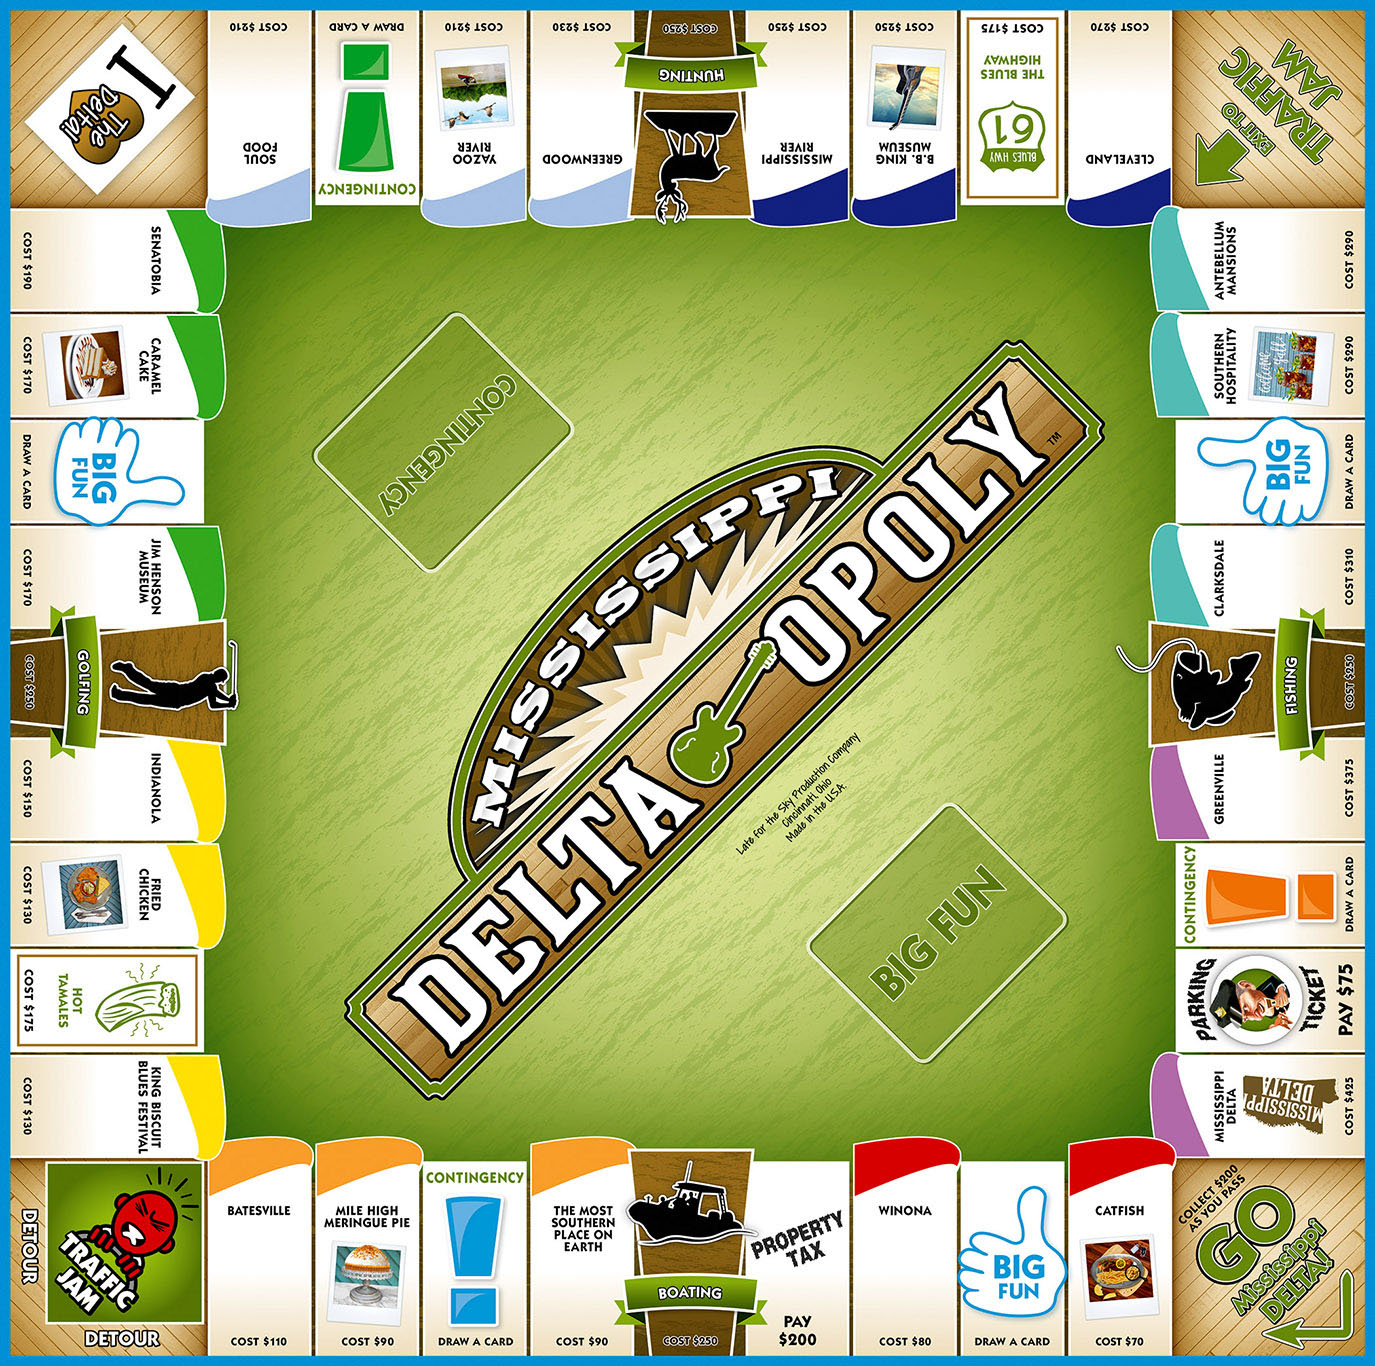 MISSISSIPPI DELTA-OPOLY Board Game